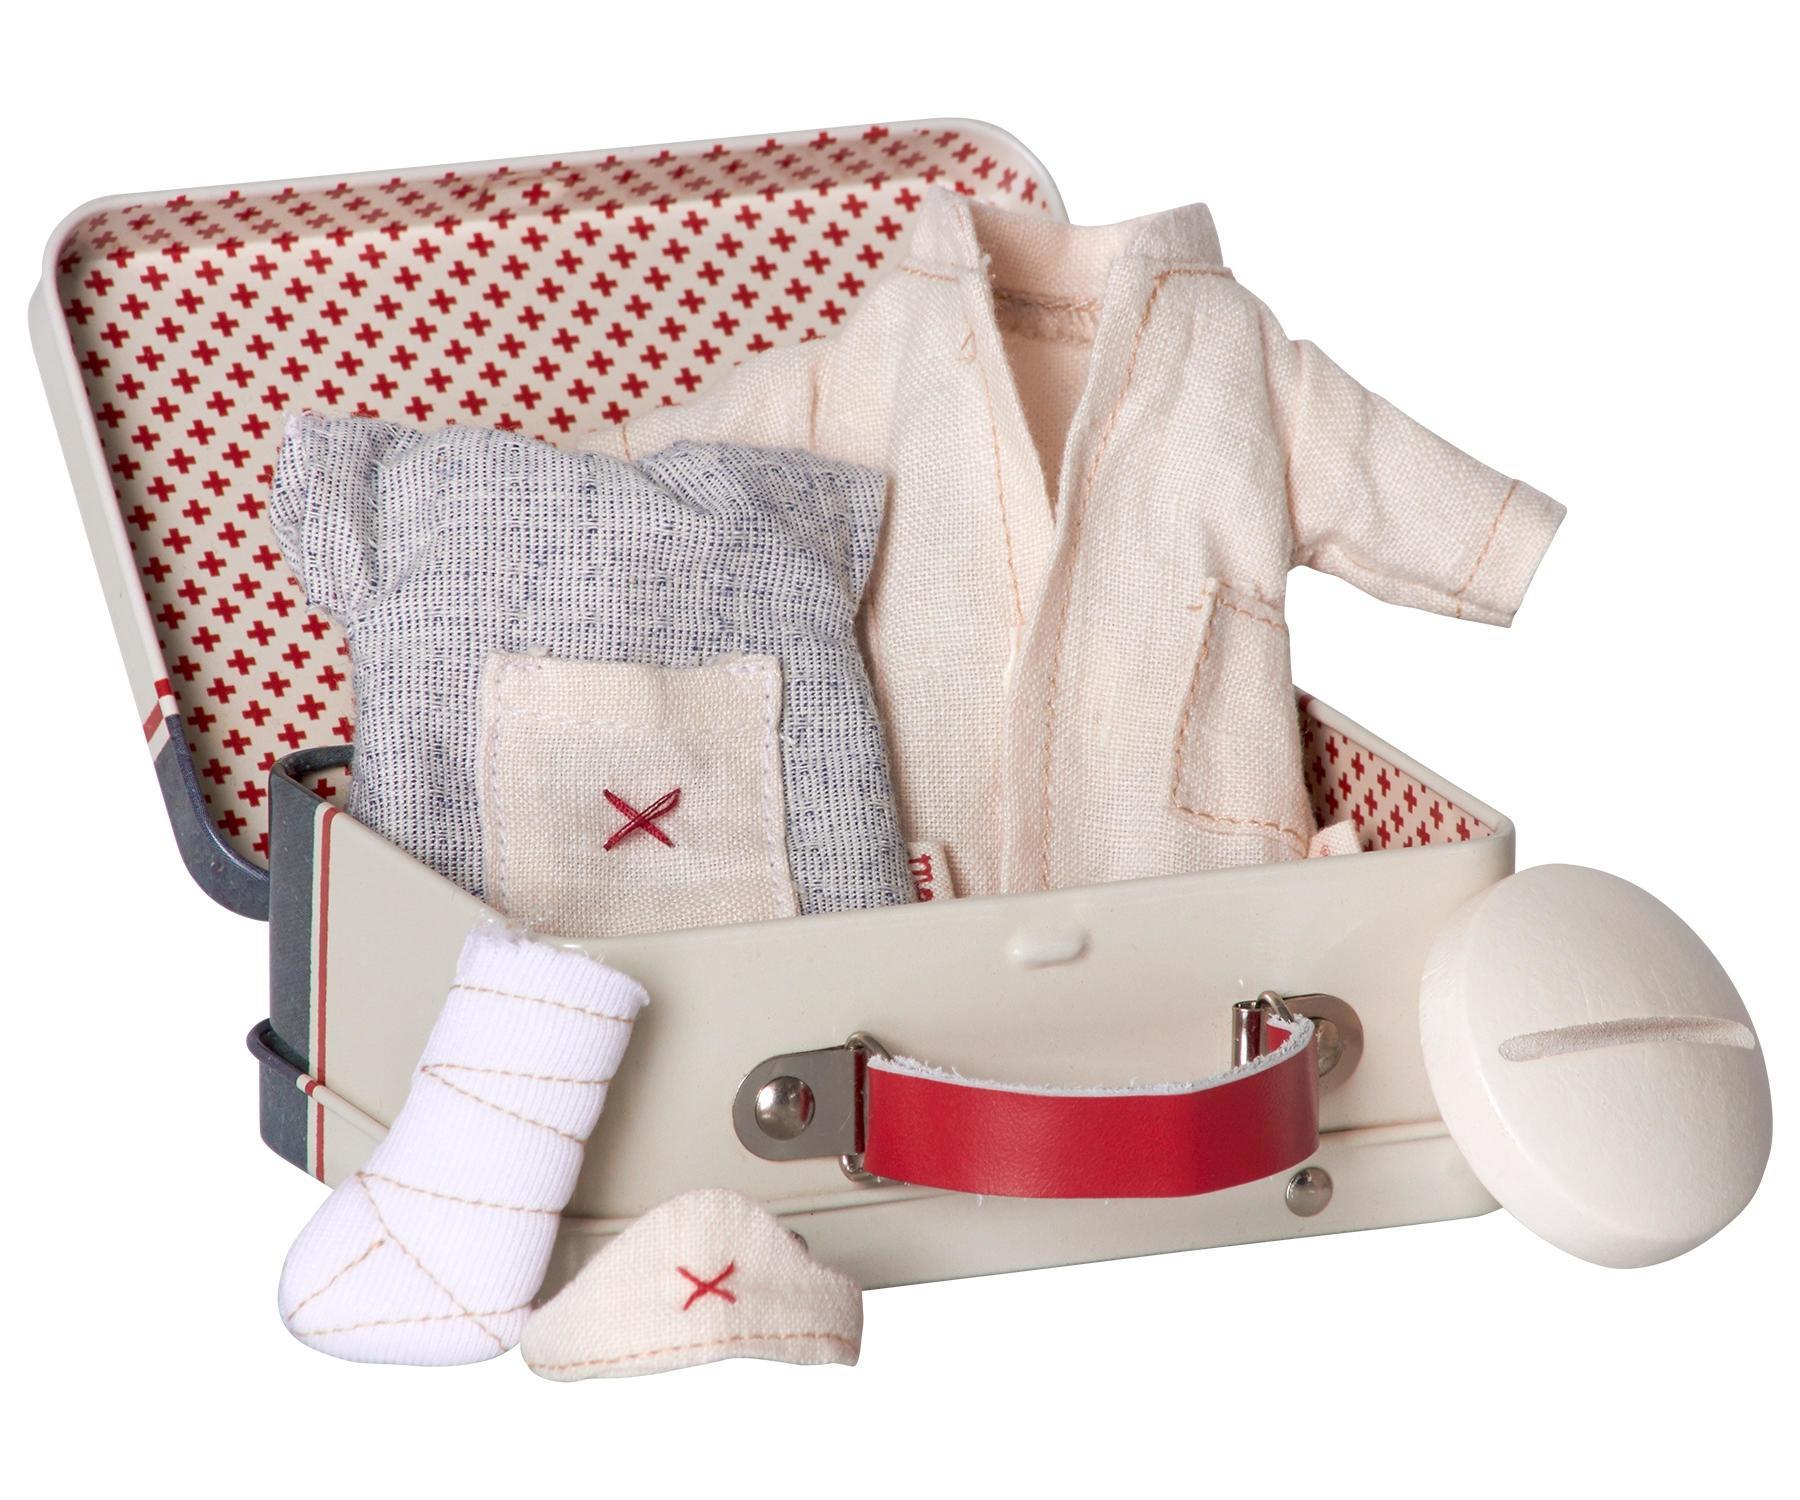 Maileg Plechový kufřík s oblečky Nurse and Doctor - micro, multi barva, kov, textil